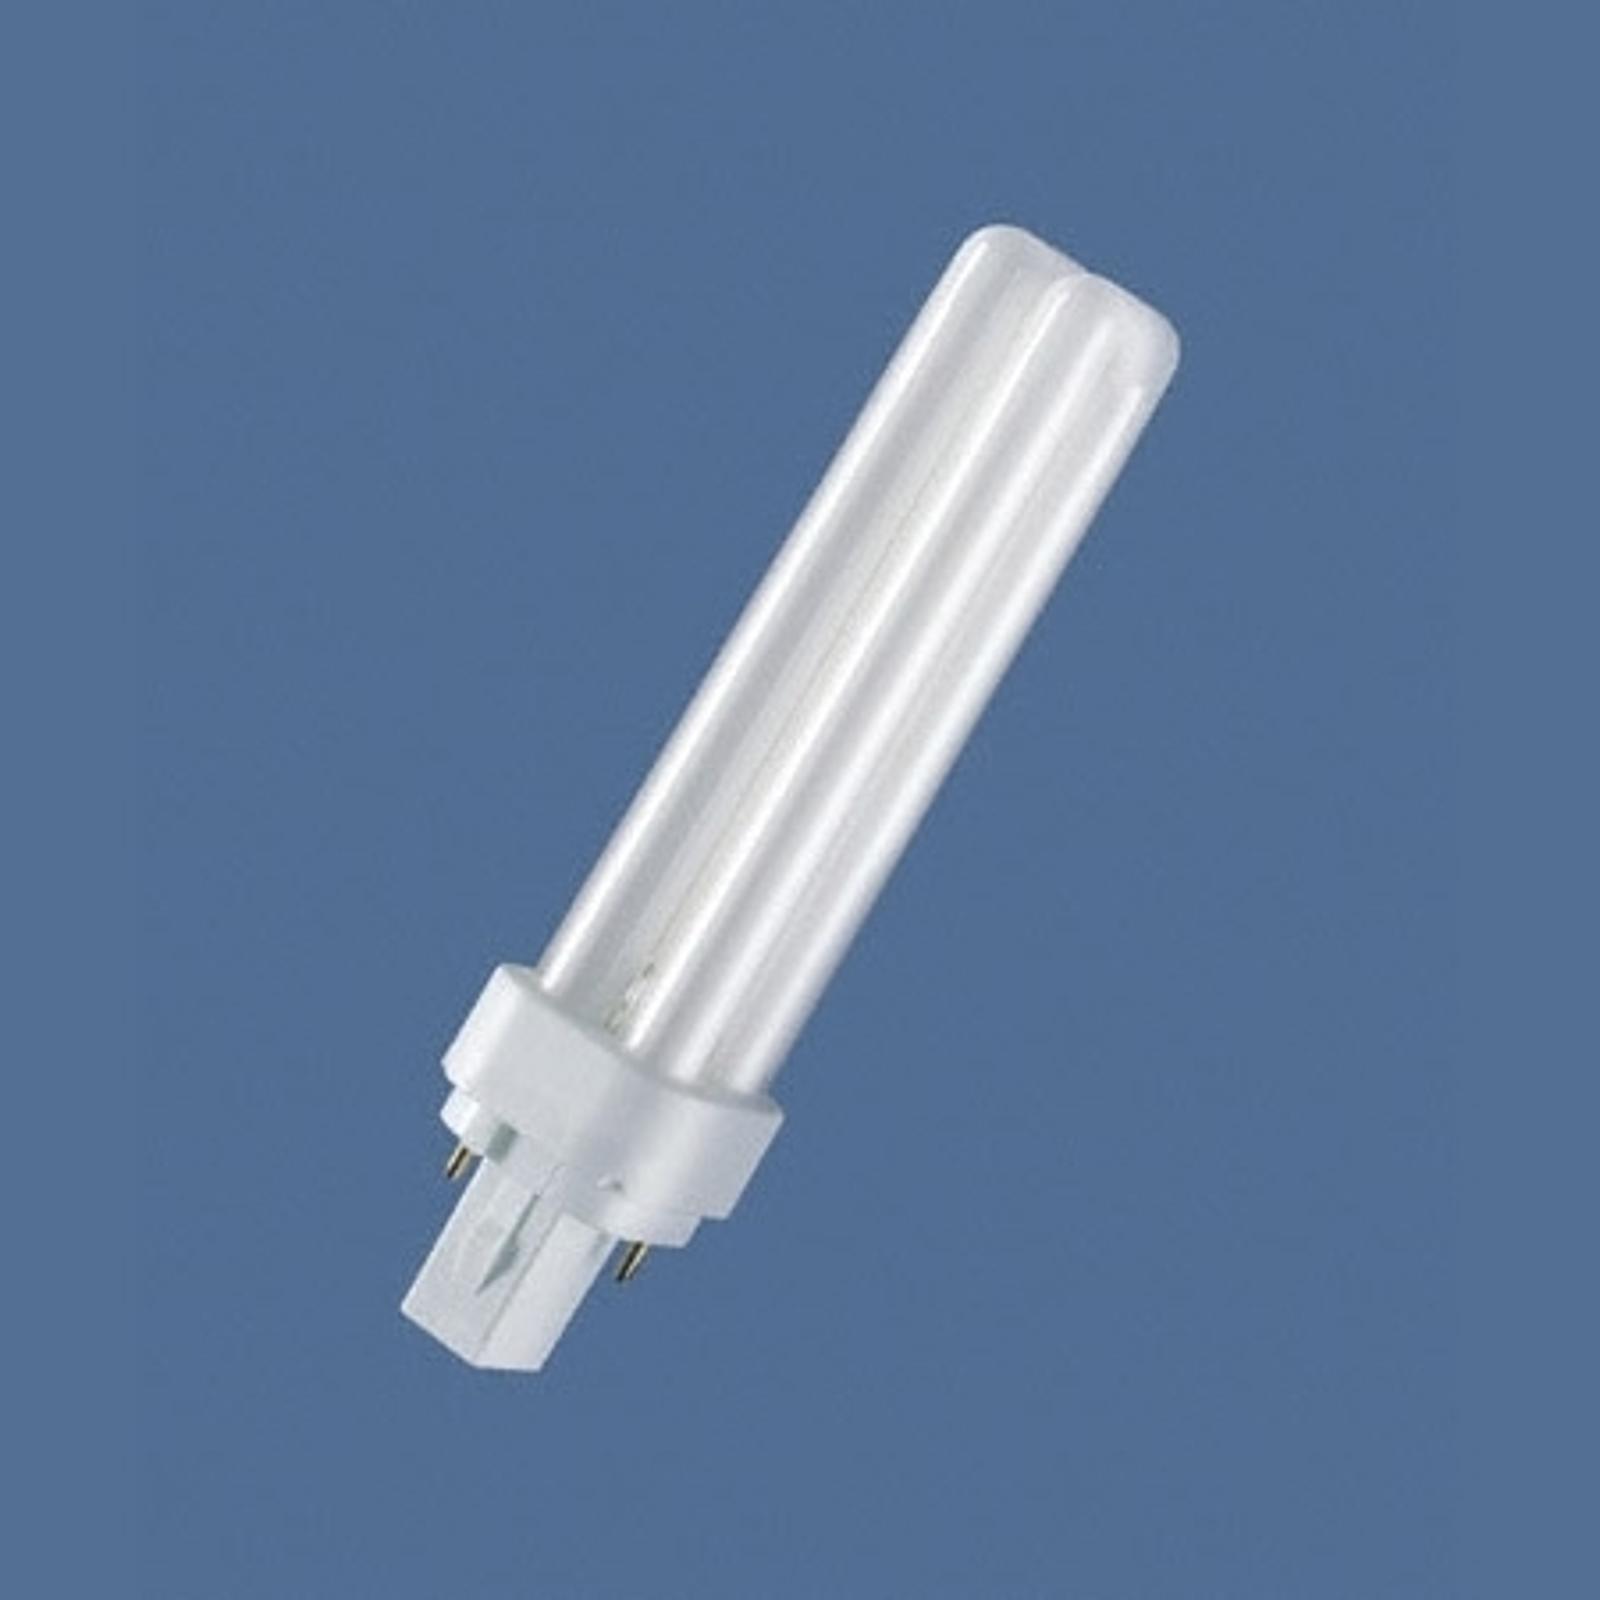 G24d 10W 830 Kompaktleuchtstofflampe Dulux D